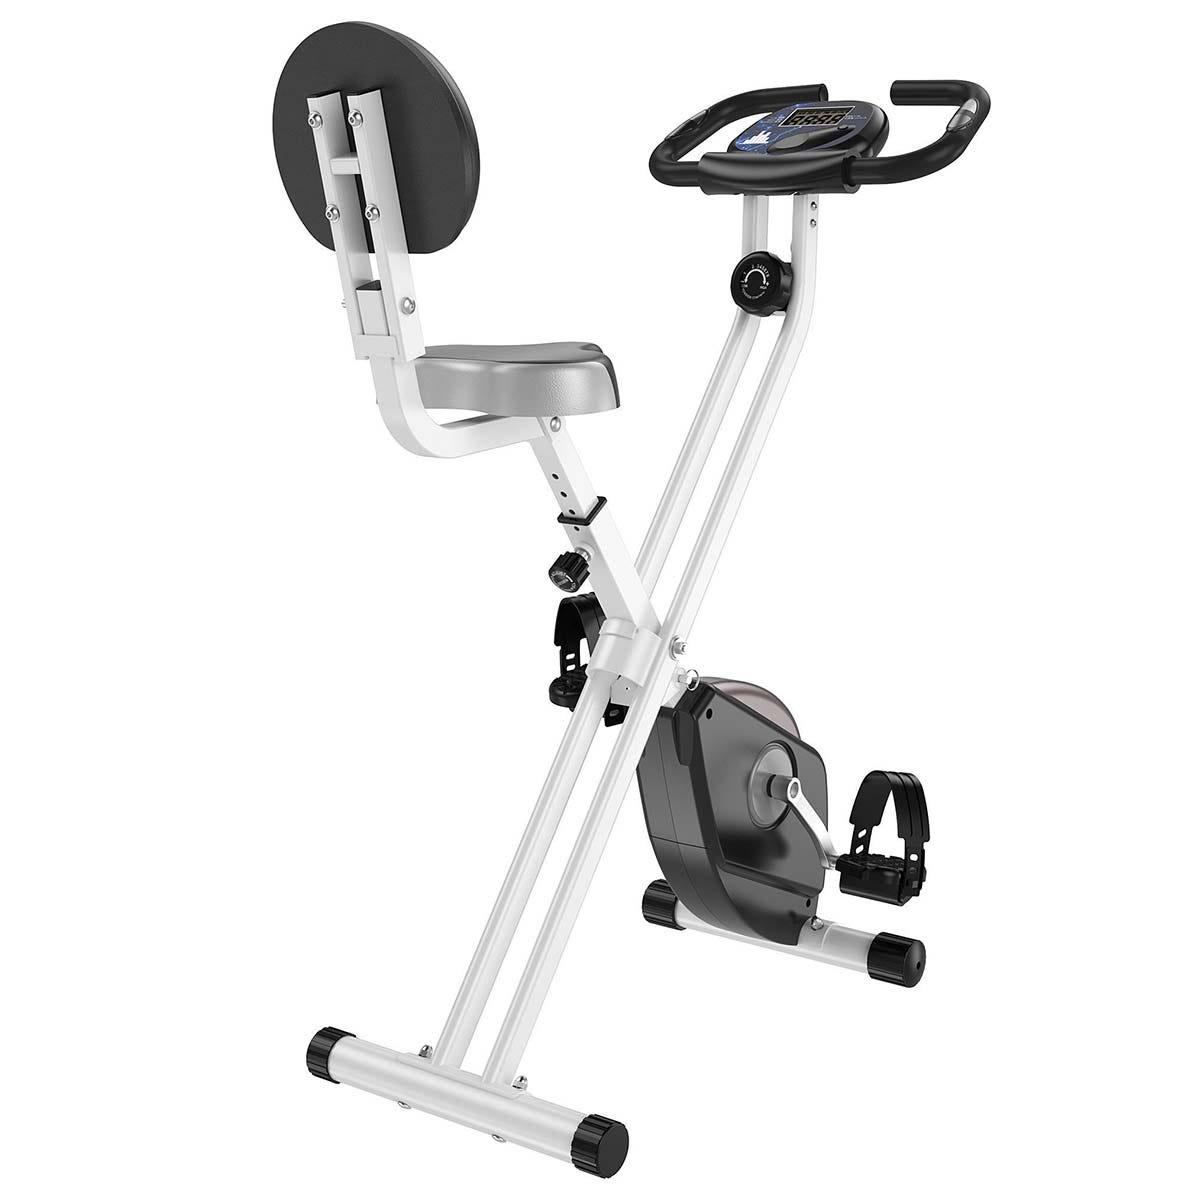 HOMCOM Magnetic Resistance Exercise Bike Foldable LCD Adjustable Seat Grey